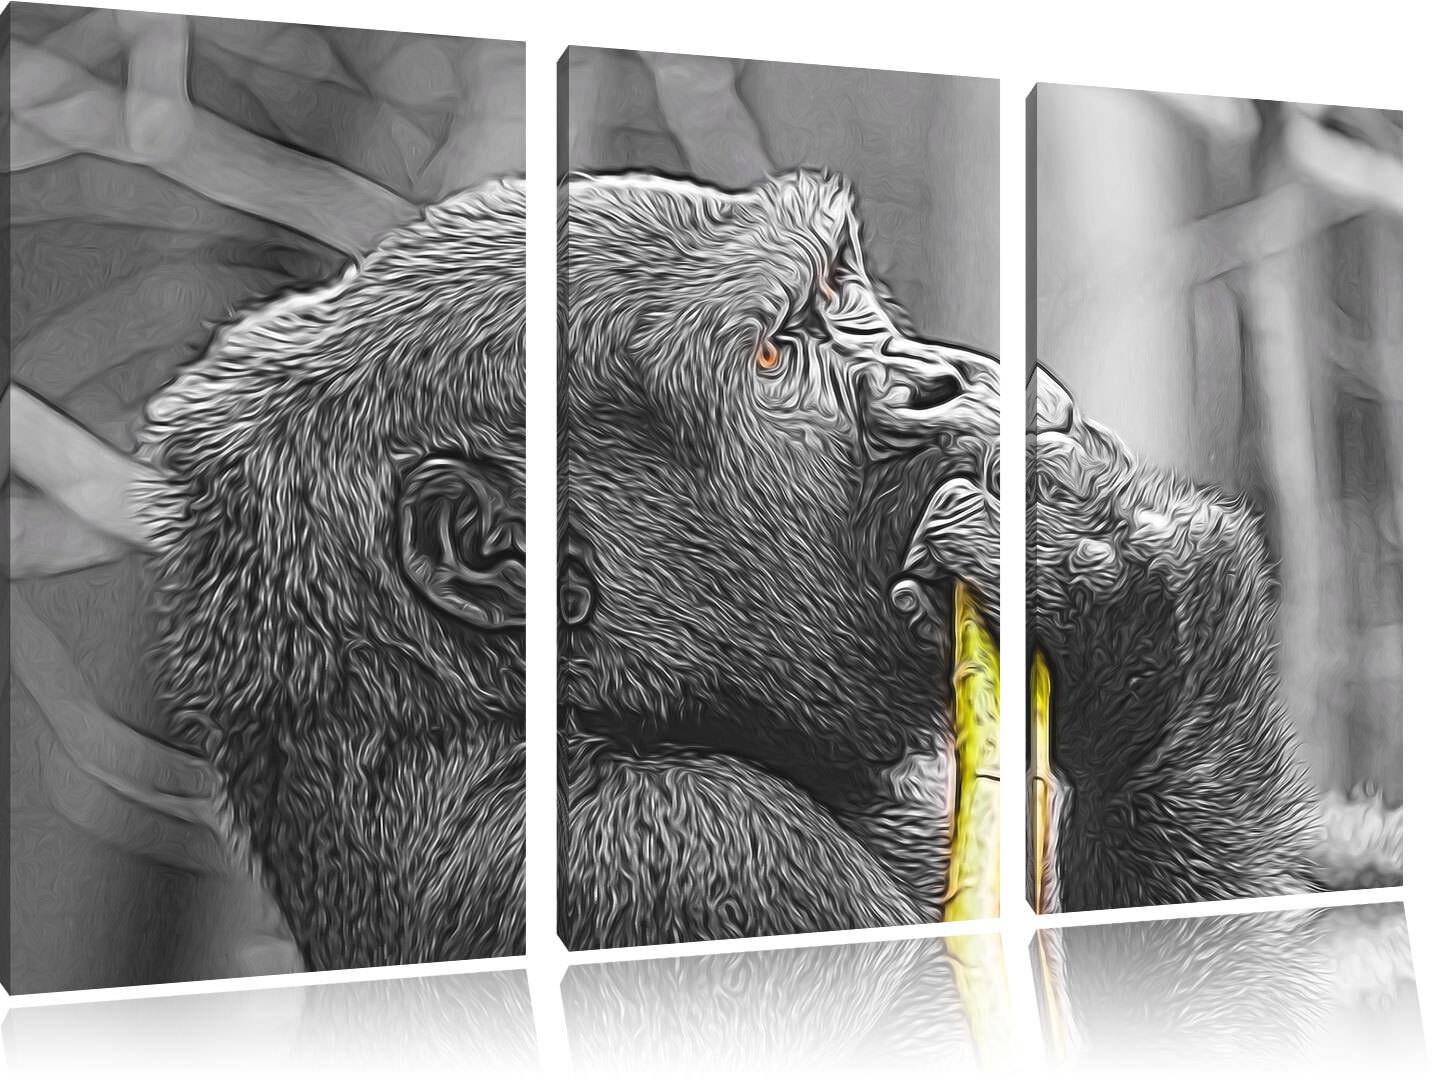 Fiero Gorilla Mangia Deluxe 3-Teiler 3-Teiler Quadro su Tel Decorazione Parete